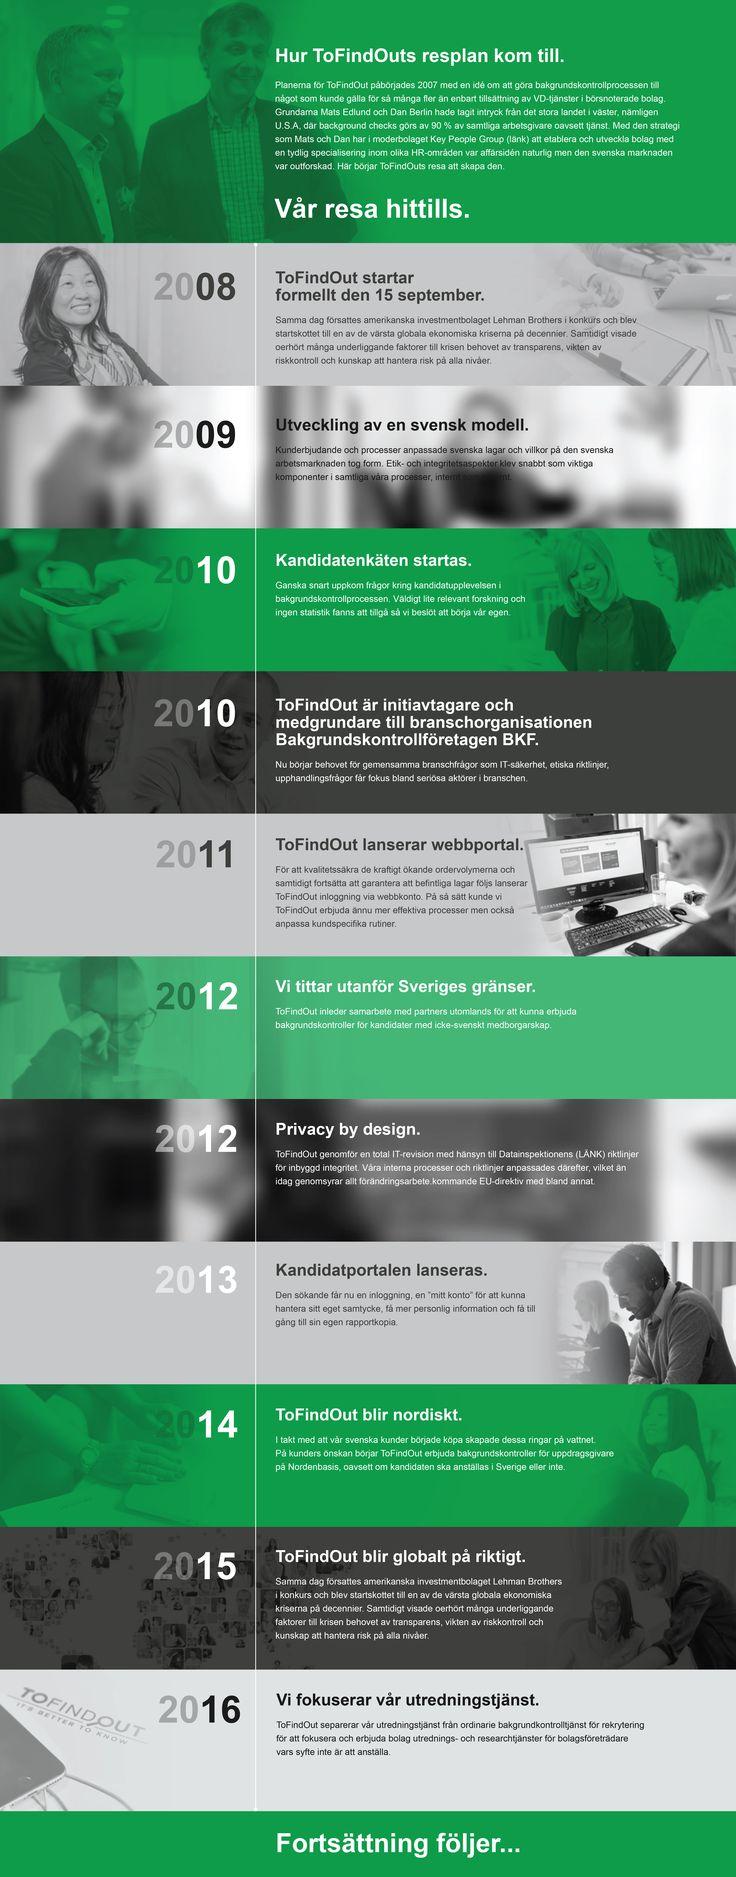 ToFindOut företags-tidslinje. (2016)